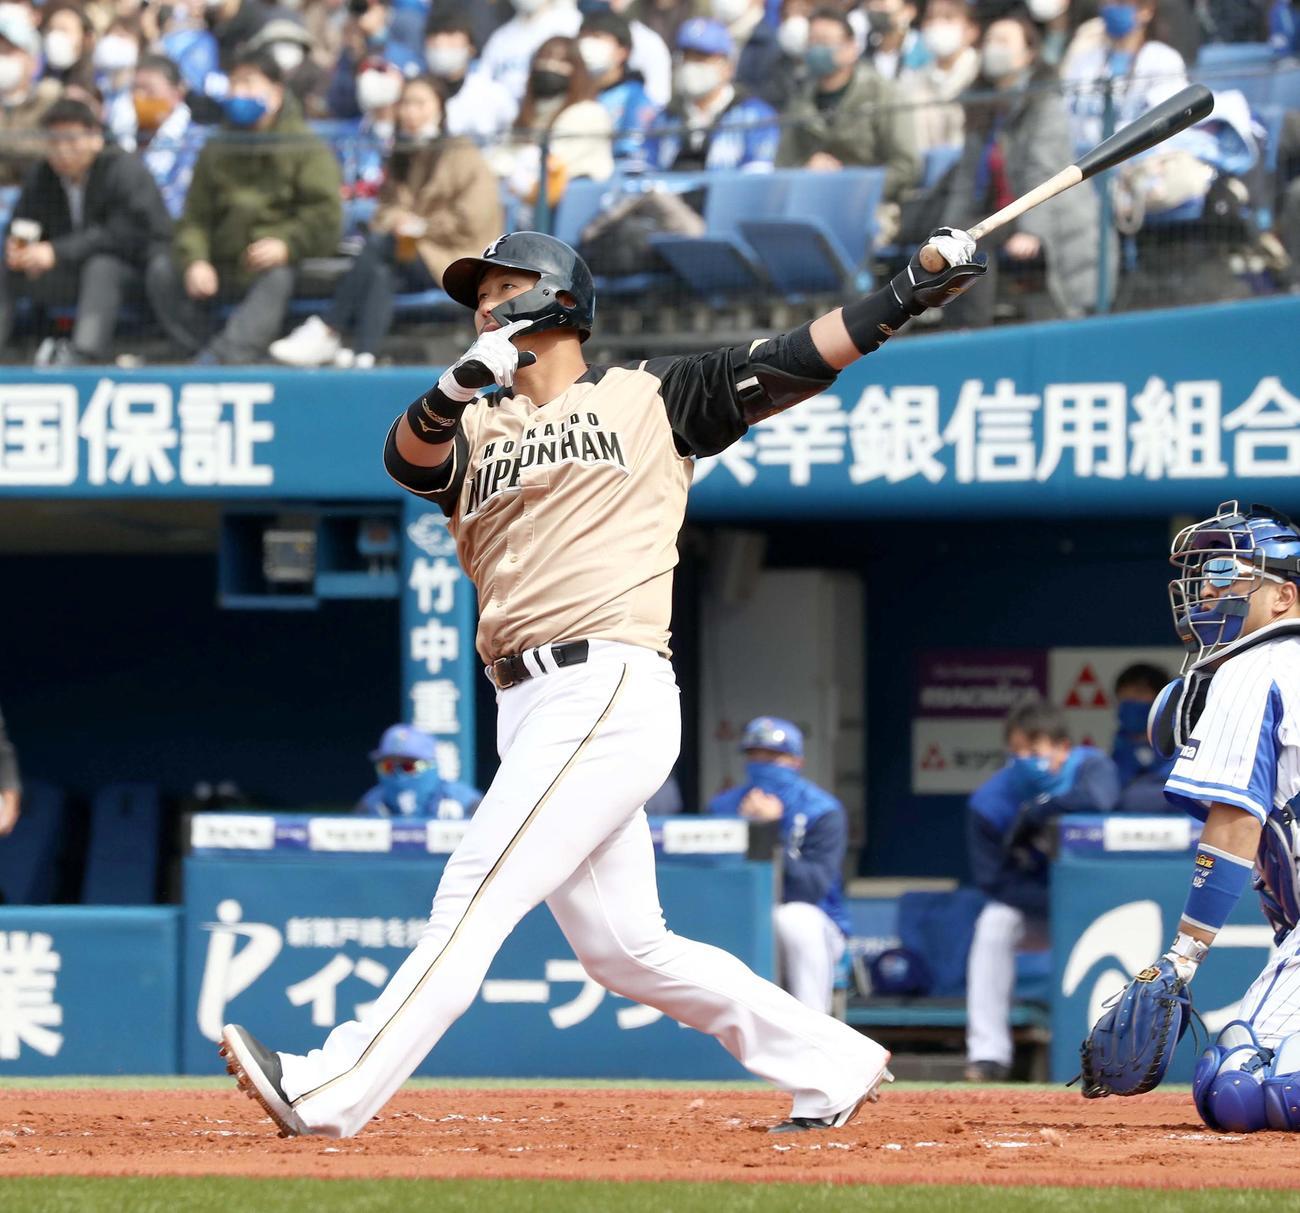 DeNA対日本ハム 1回表日本ハム1死一、二塁、左越え3点本塁打を放つ中田(撮影・黒川智章)